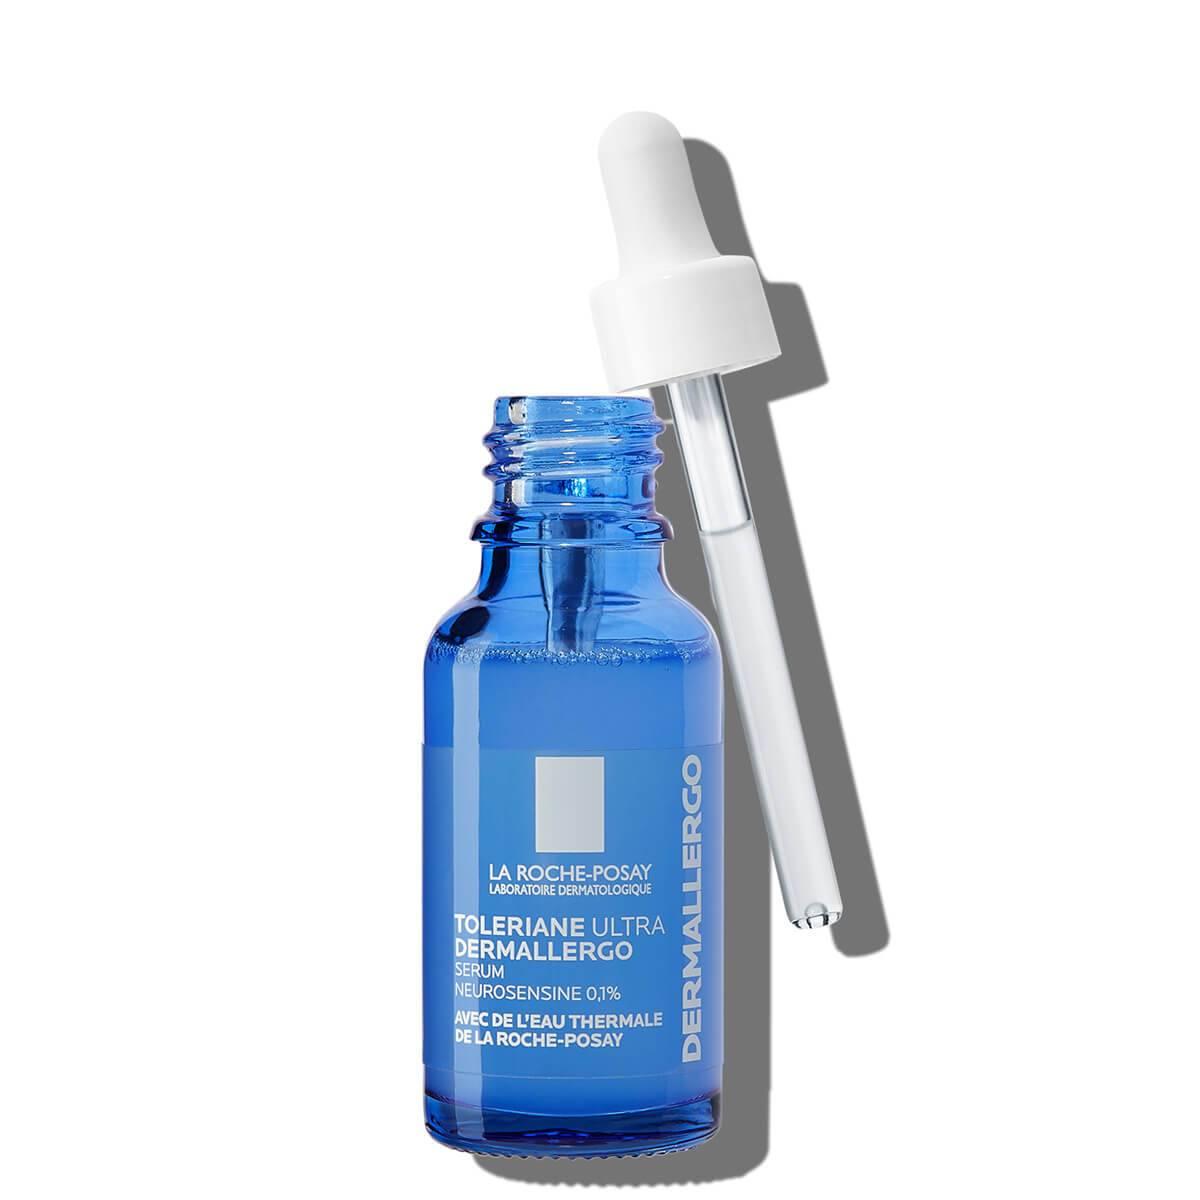 Alergiczna Toleriane UltraDermallergo 20ml 693820 OpenSS 1 | La Roche Posay